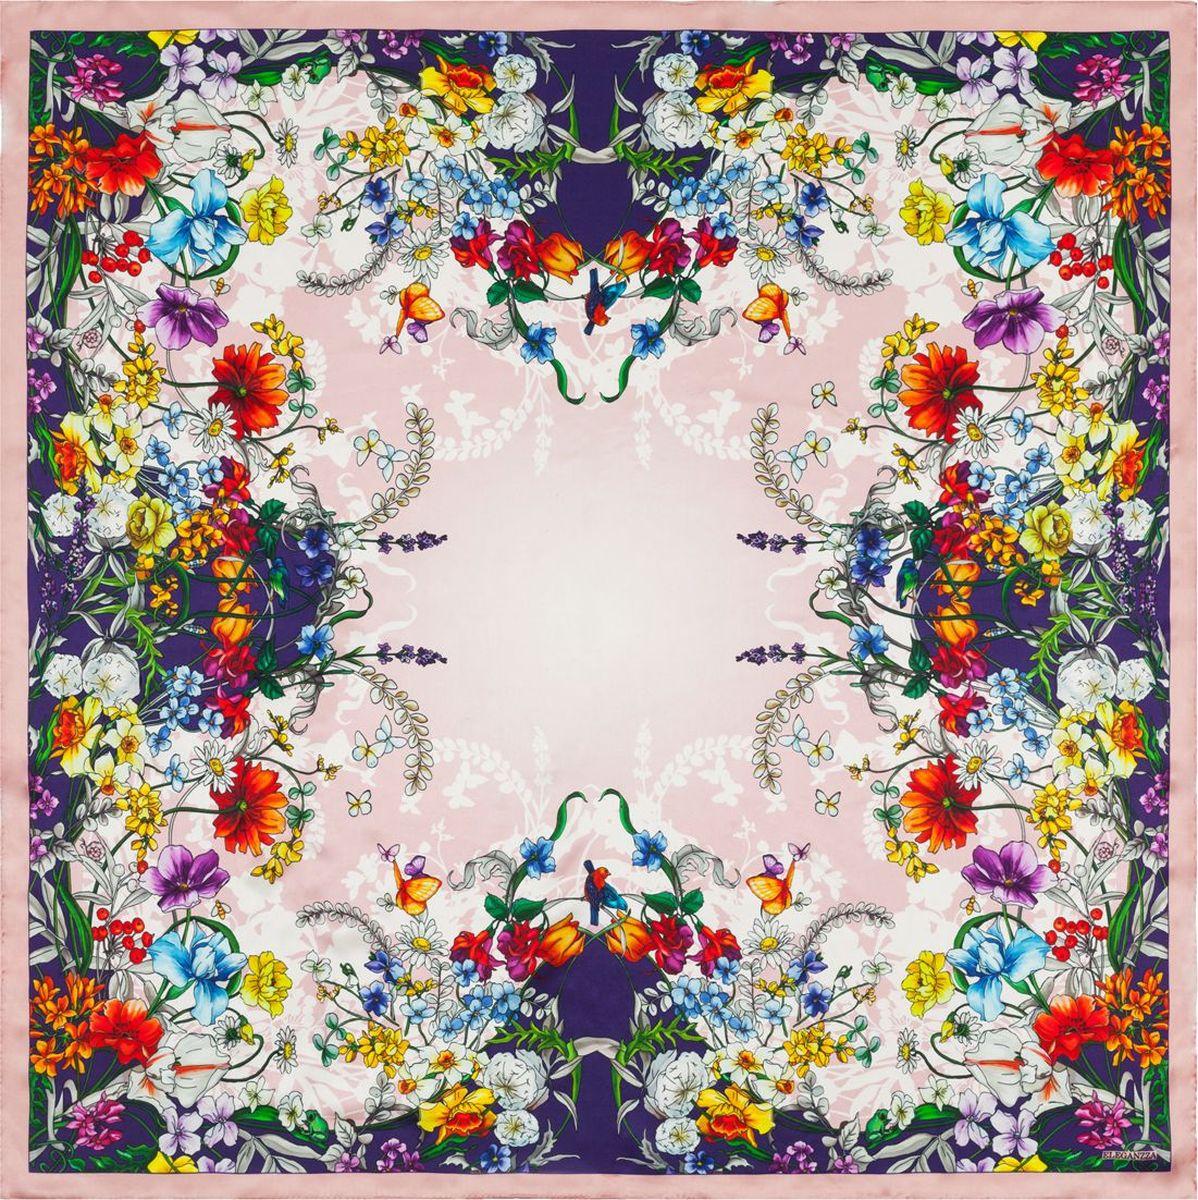 Платок Eleganzza платок женский eleganzza цвет светло серый d34 1219 19 размер 110 х 110 см